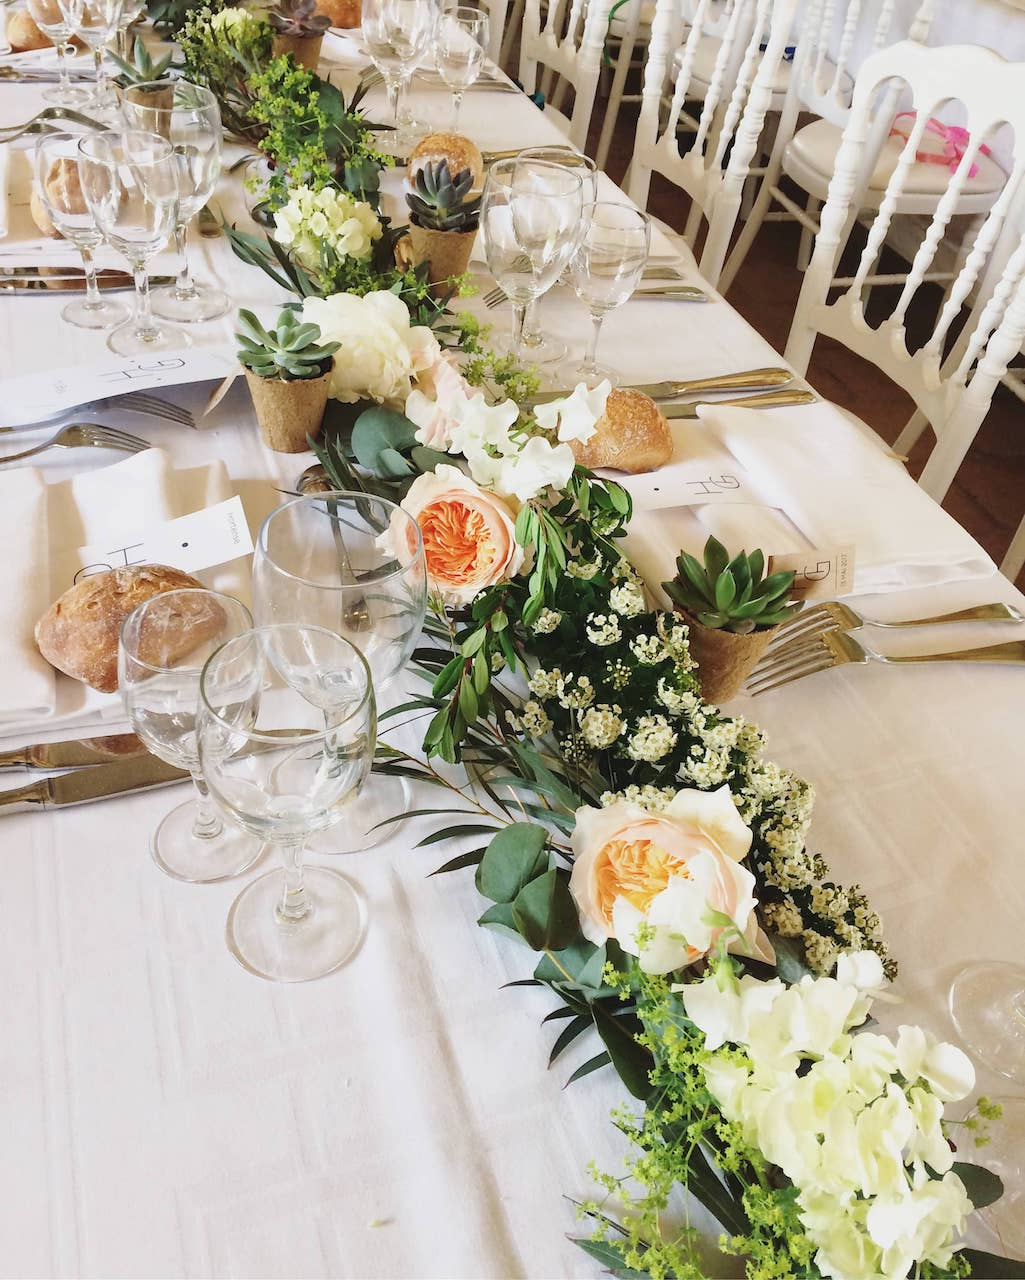 lieu-reception-chemin-table-champetre-mariage